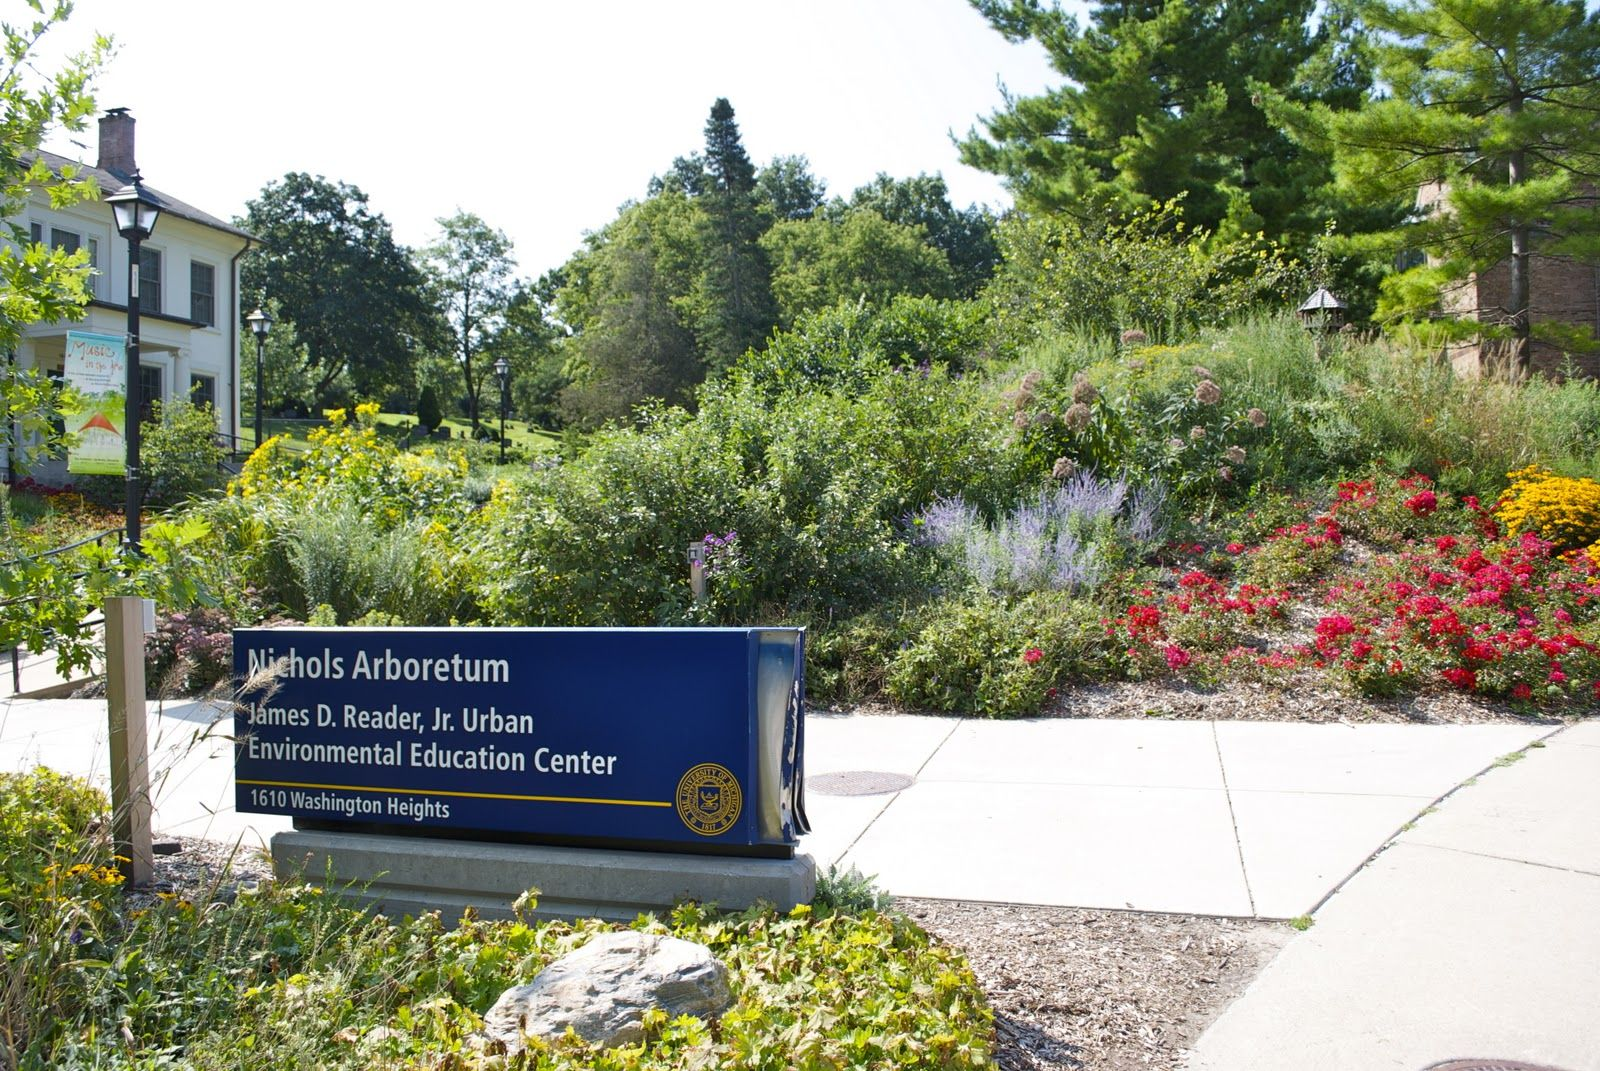 Nichols arboretum at the university of michigan in ann arbor michigan pure michigan for University of michigan botanical gardens